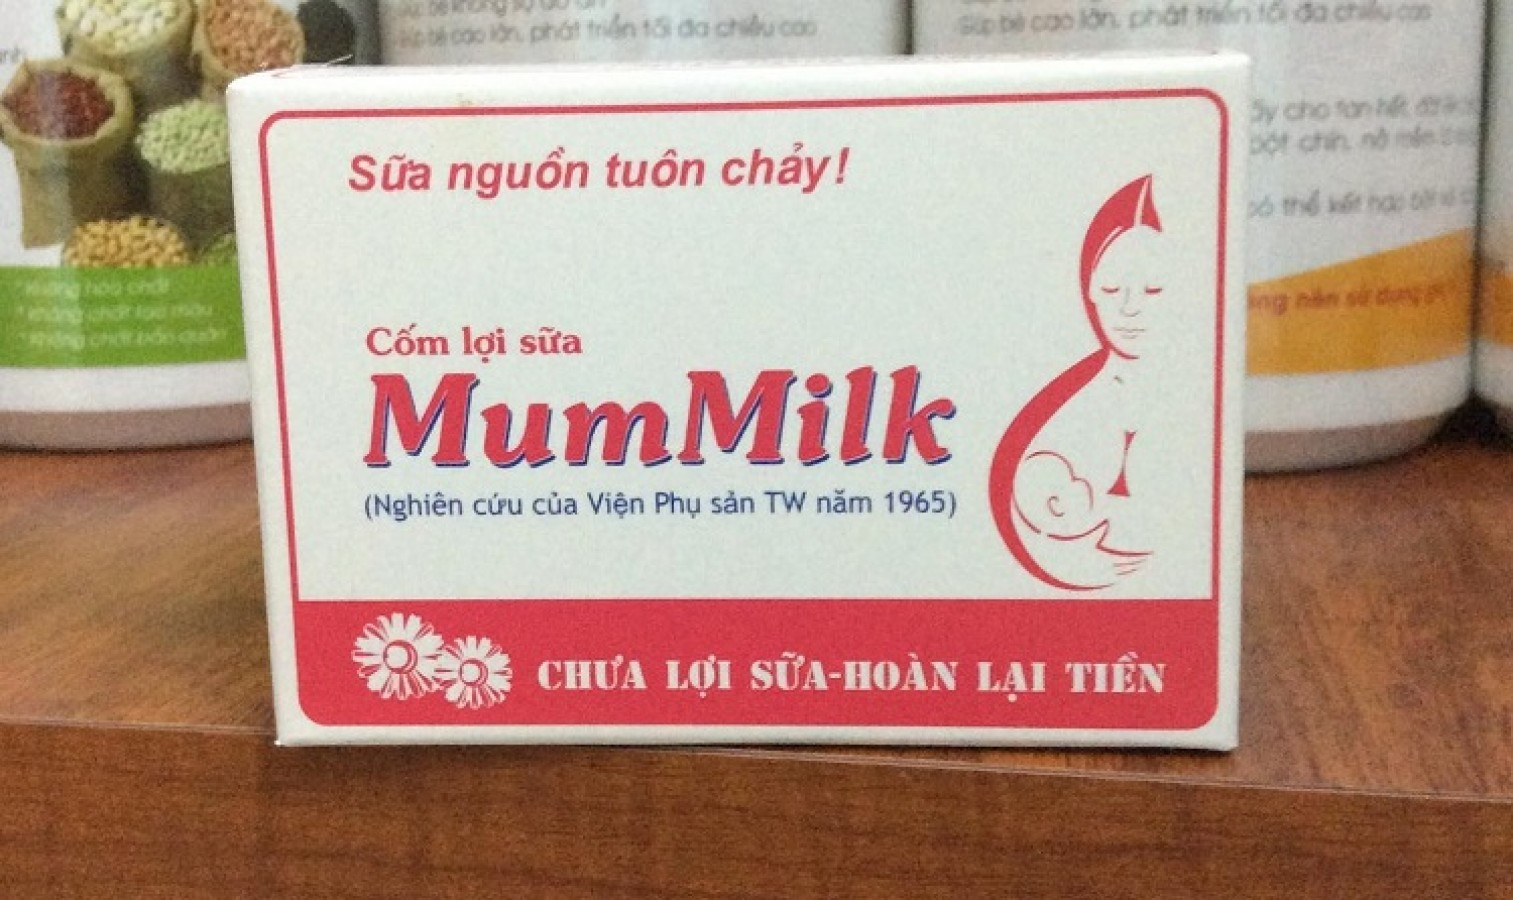 Combo 3 Hộp Cốm Lợi Sữa Mummilk Cho Phụ Nữ Sau Sinh